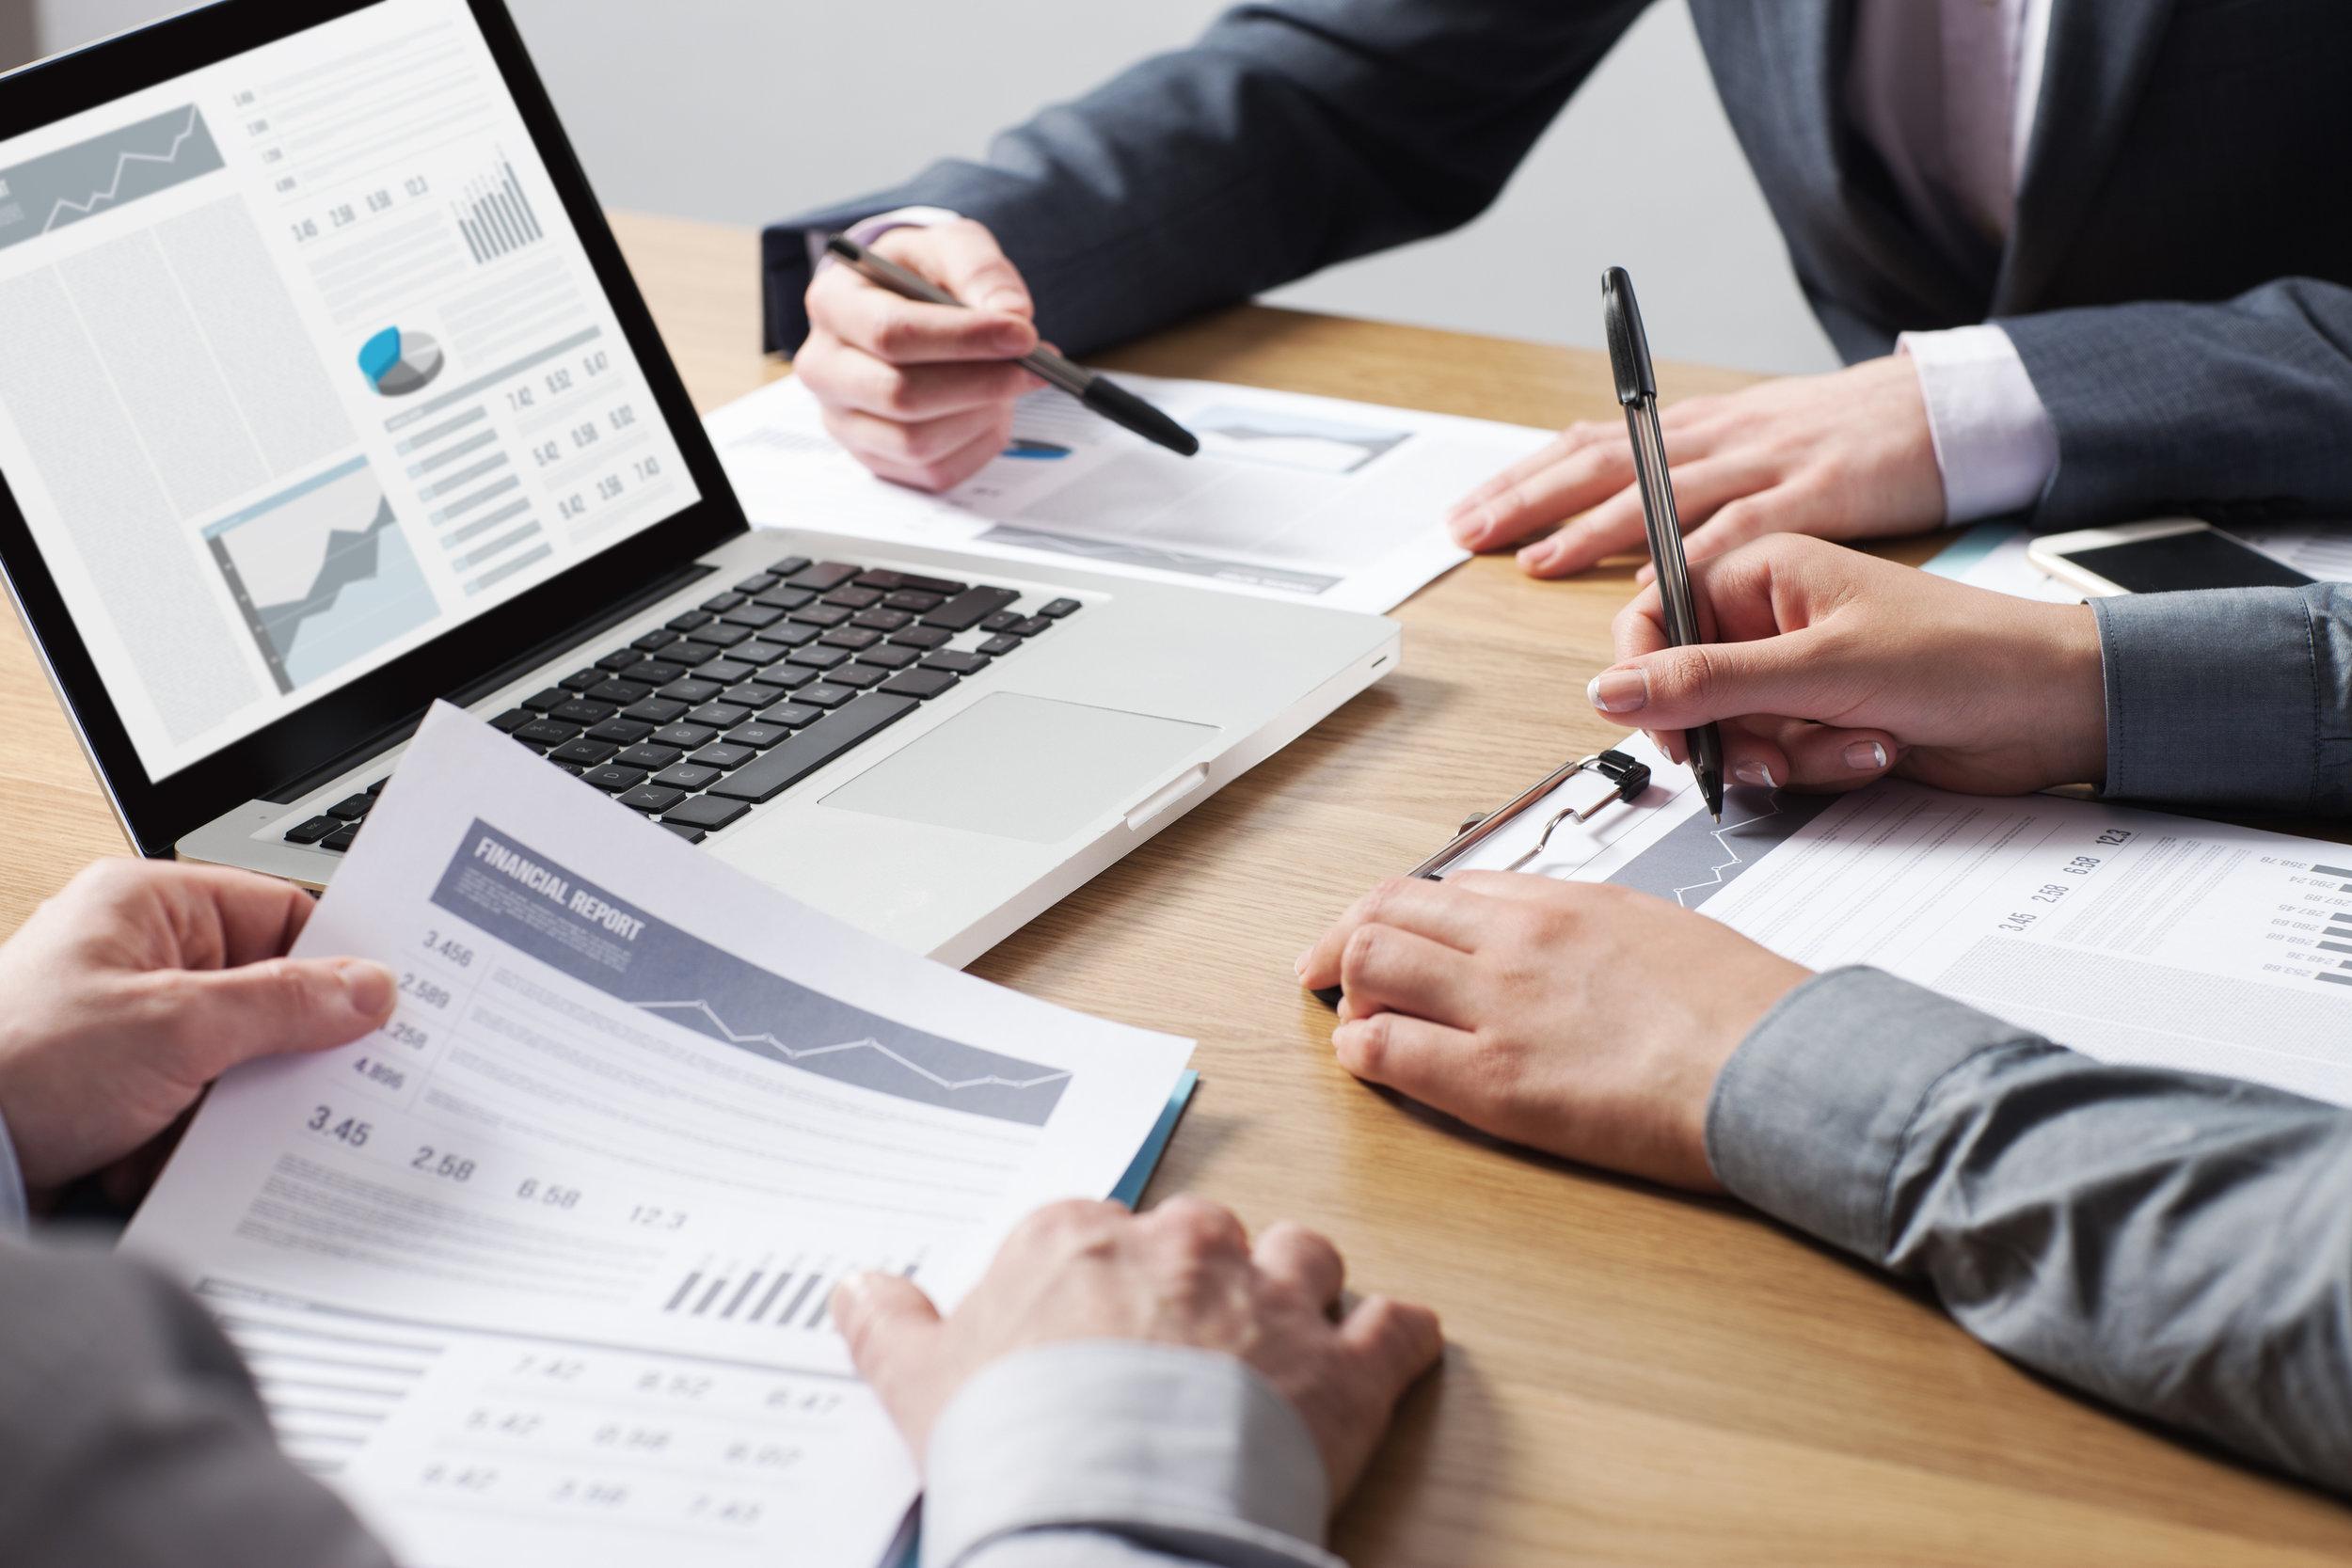 bigstock-Business-Professionals-Analyzi-105044972.jpg